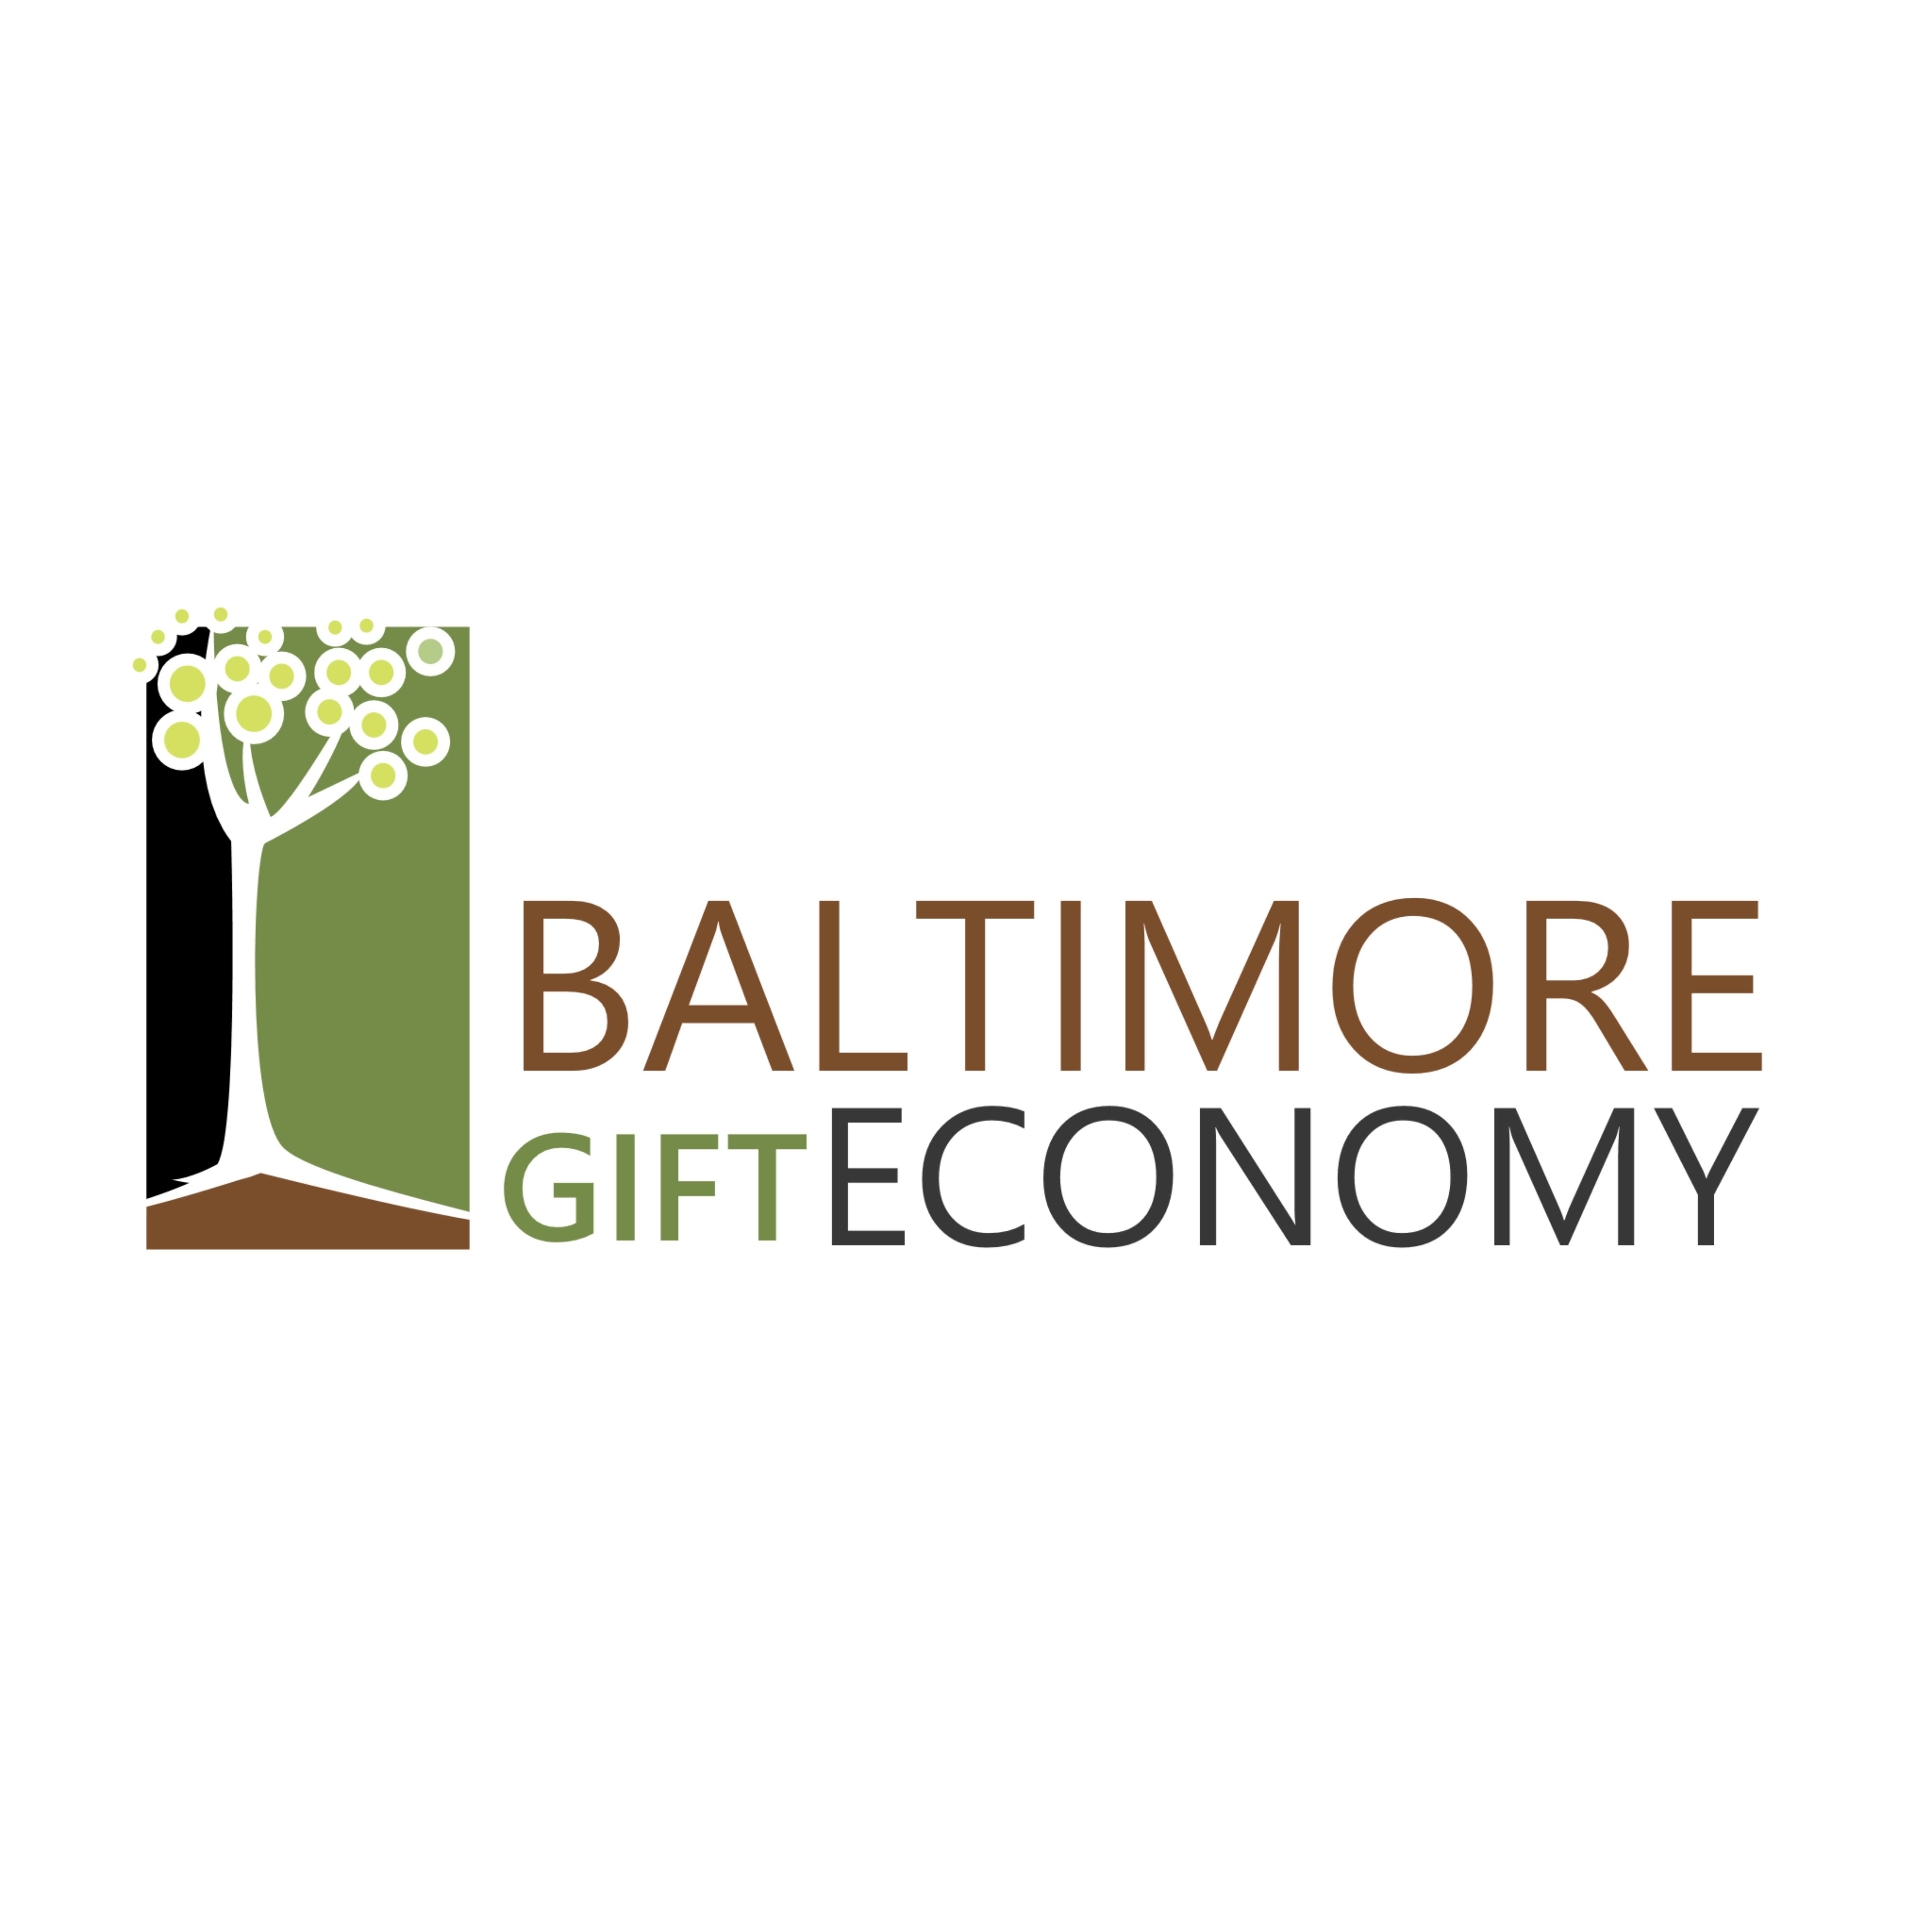 Baltimore Gift Economy